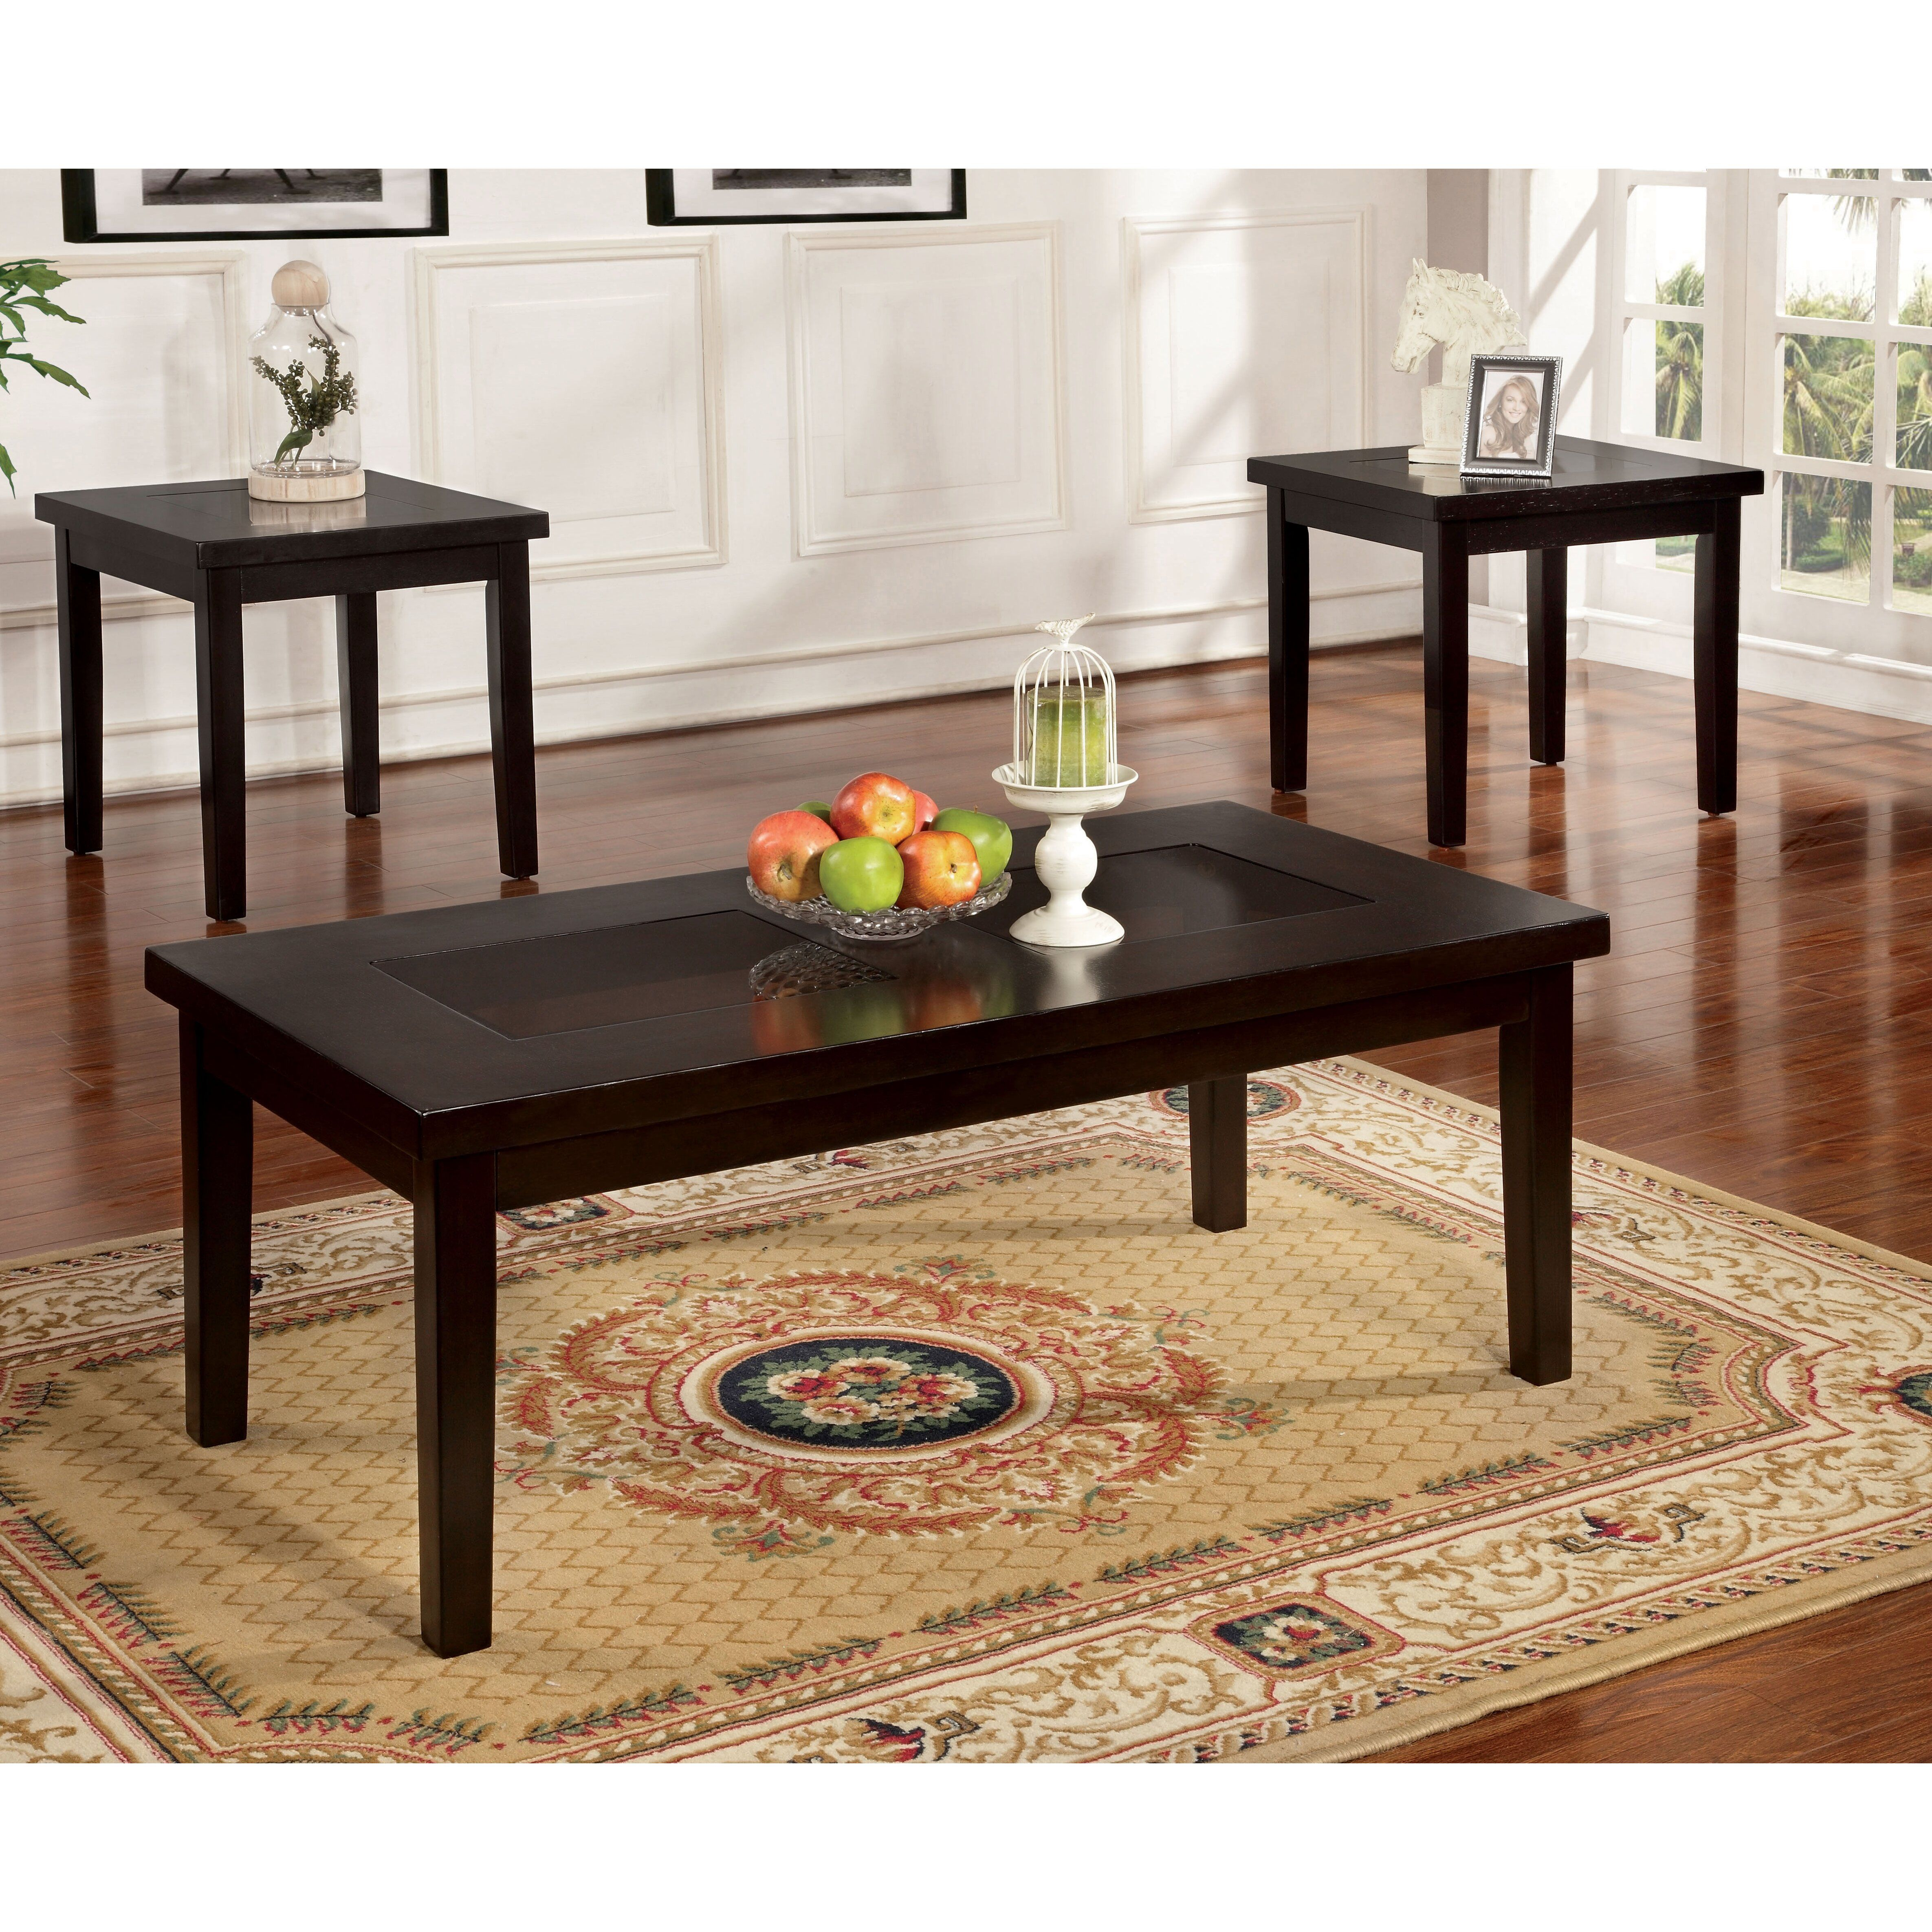 Top Wayfair Coffee Table Sets Coffee Table 3 Piece Coffee Table Set Furniture Of America [ 4742 x 4742 Pixel ]